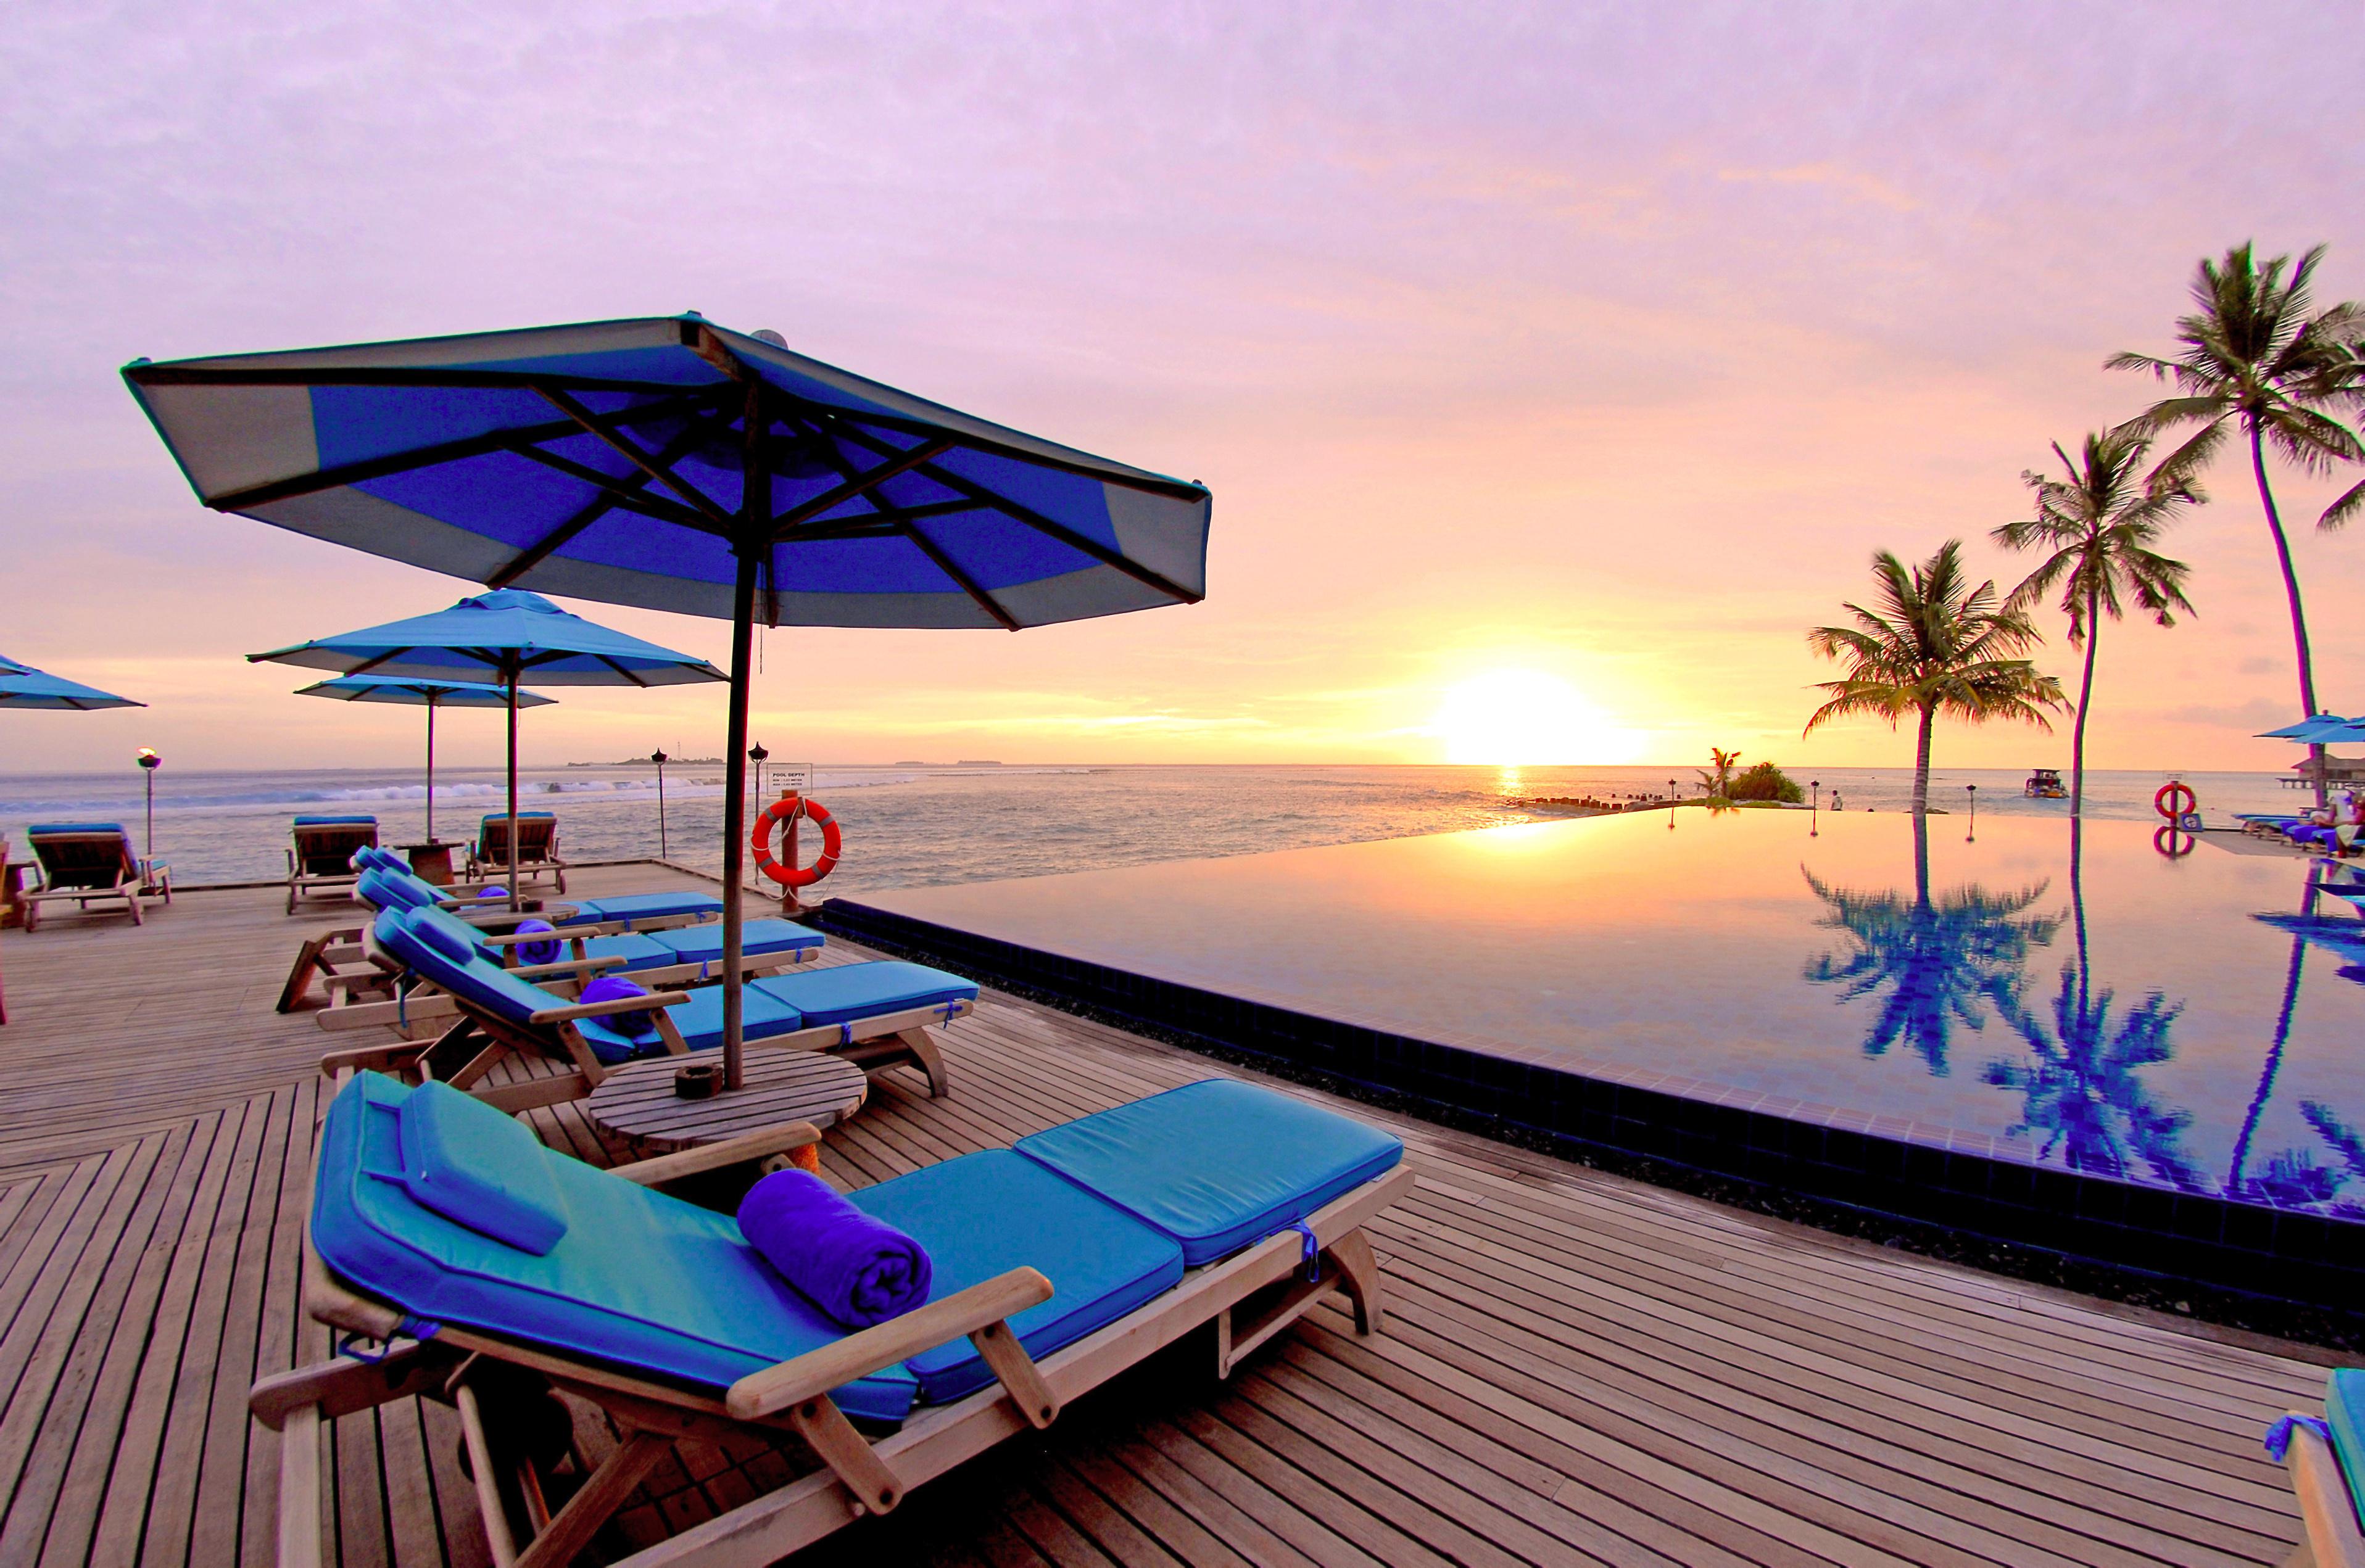 125228 free wallpaper 320x480 for phone, download images Resort, Nature, Maldives, Male Atoll, Veligandu, Anantara Veli Resort 320x480 for mobile